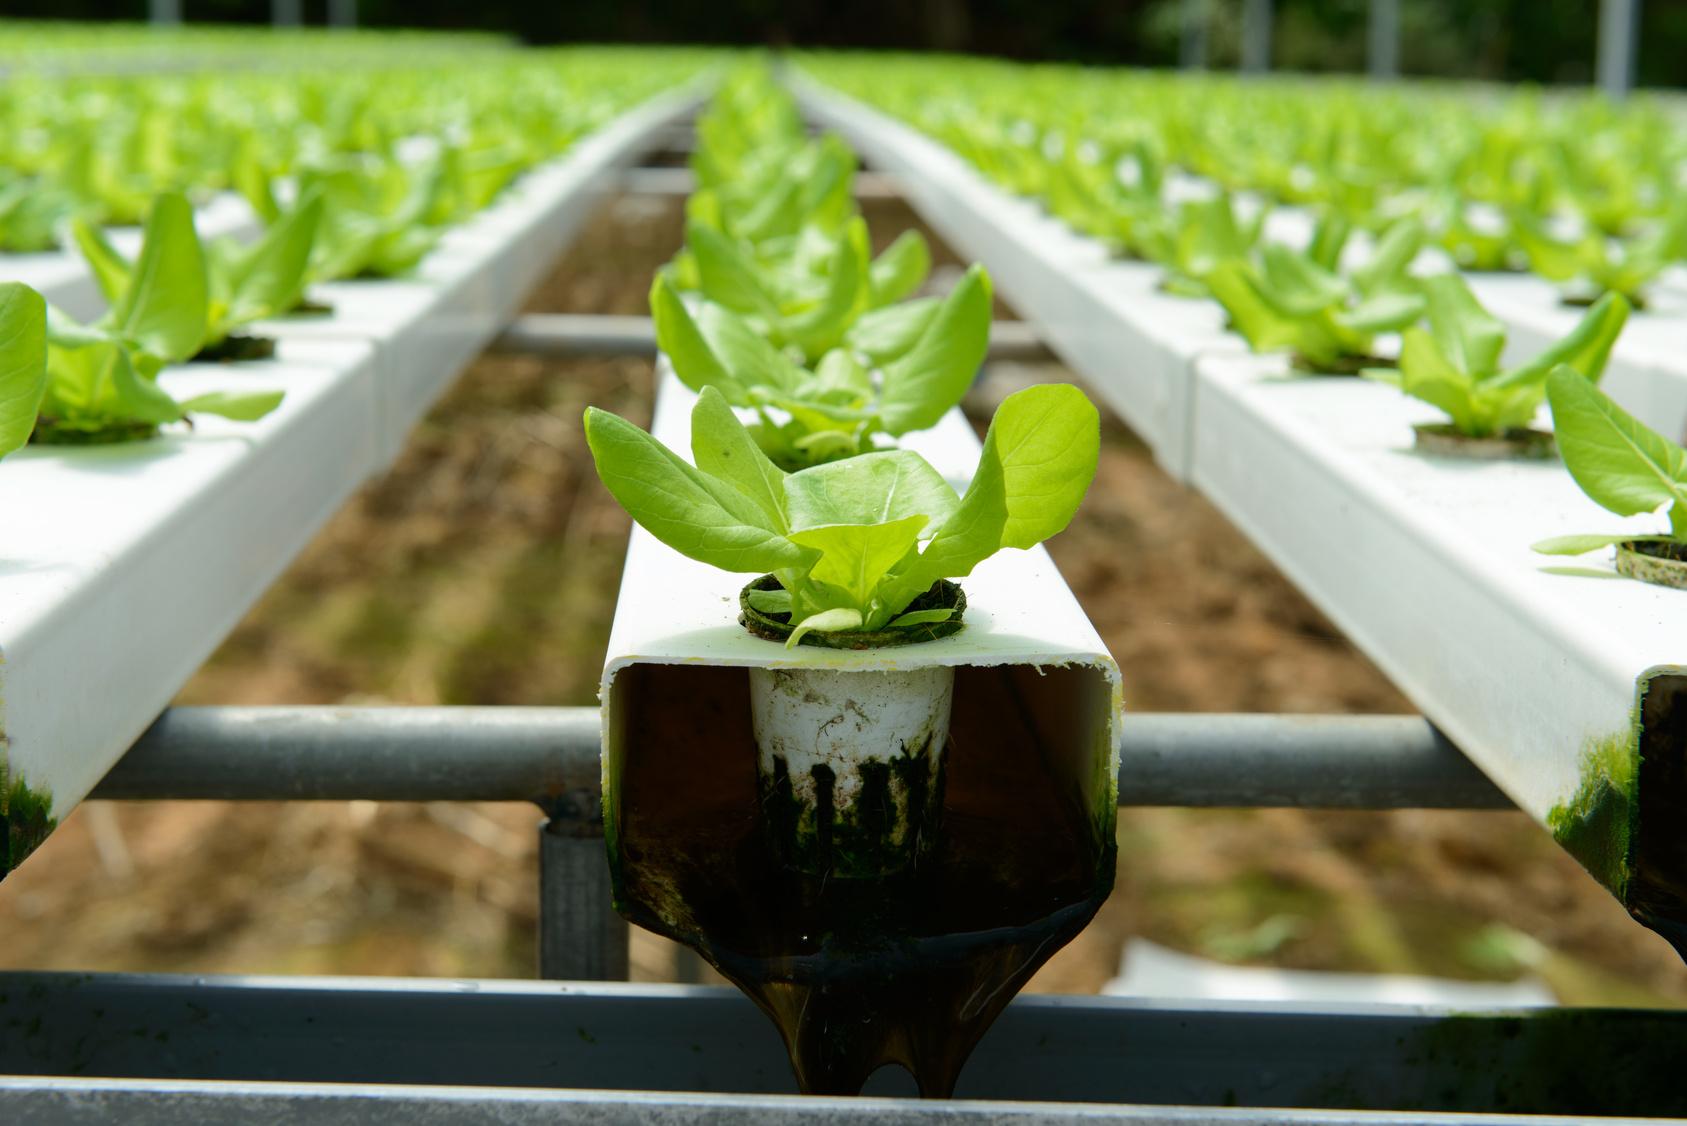 Advantech LoRa Private Solution for Smart Irrigation System - Advantech